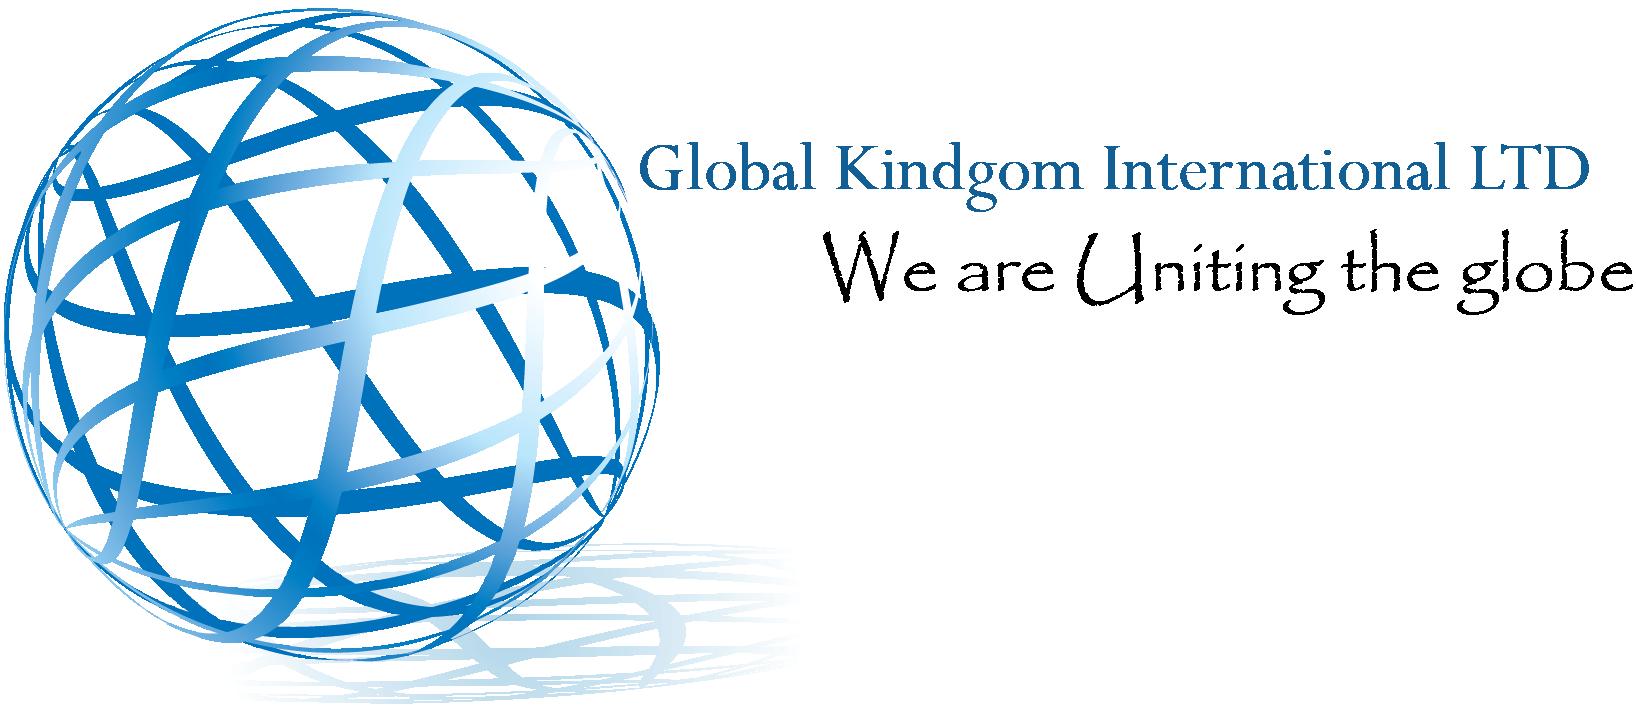 GLOBAL KINGDOM